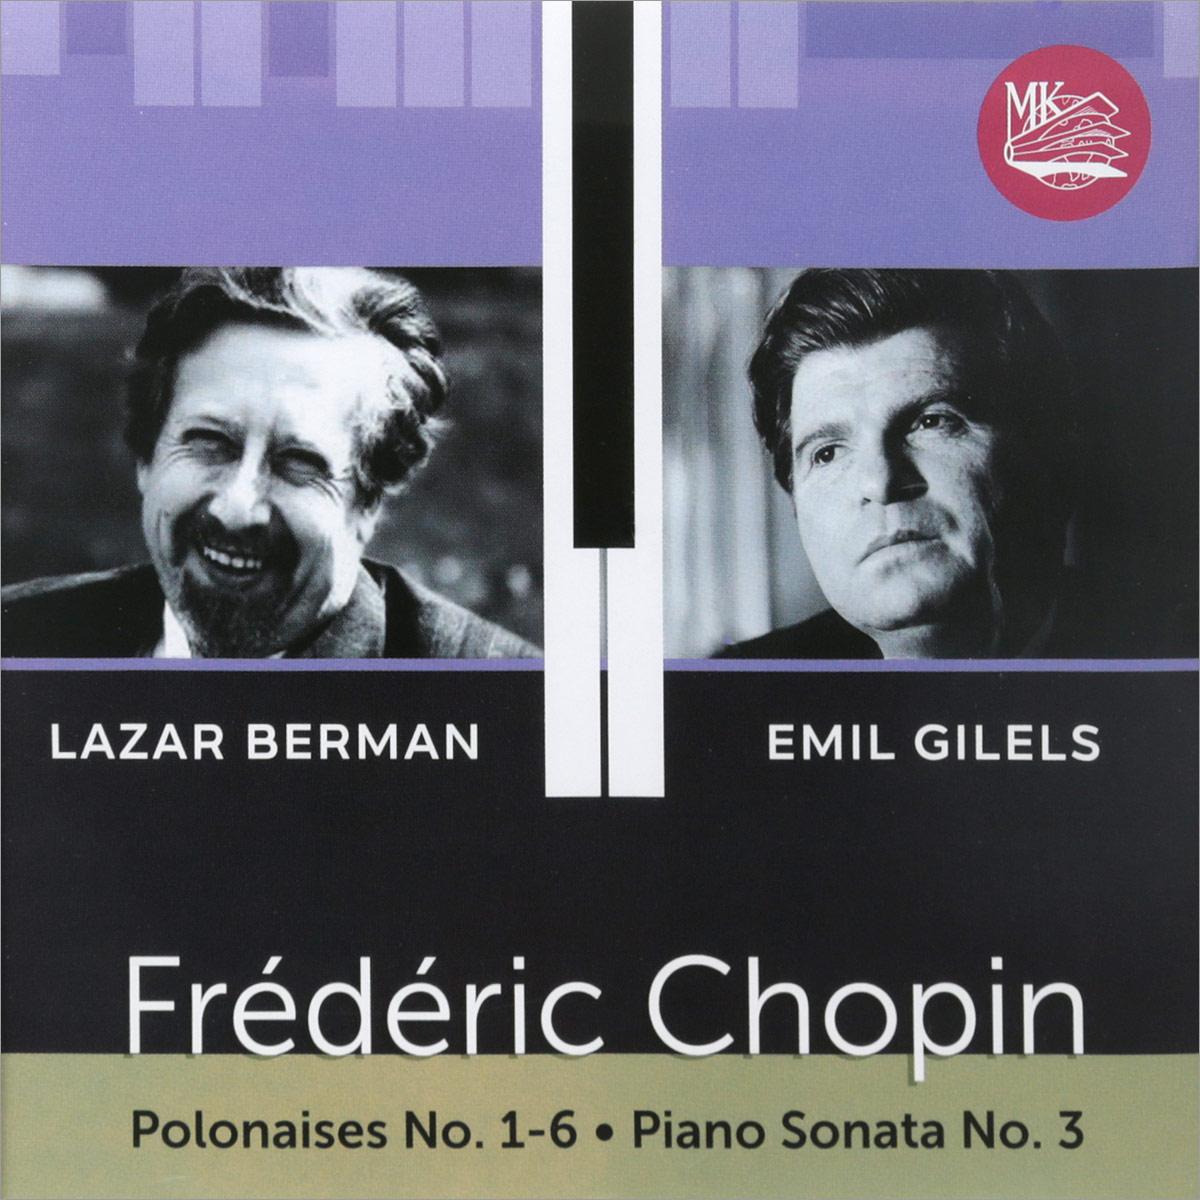 Лазарь Берман,Эмиль Гилельс Lazar Berman, Emil Gilels. Chopin. Polonaises No. 1-6 / Piano Sonata No. 3 эмиль гилельс леонид коган l beethoven piano and sonatas 3 5 9 emil gilels leonid cogan